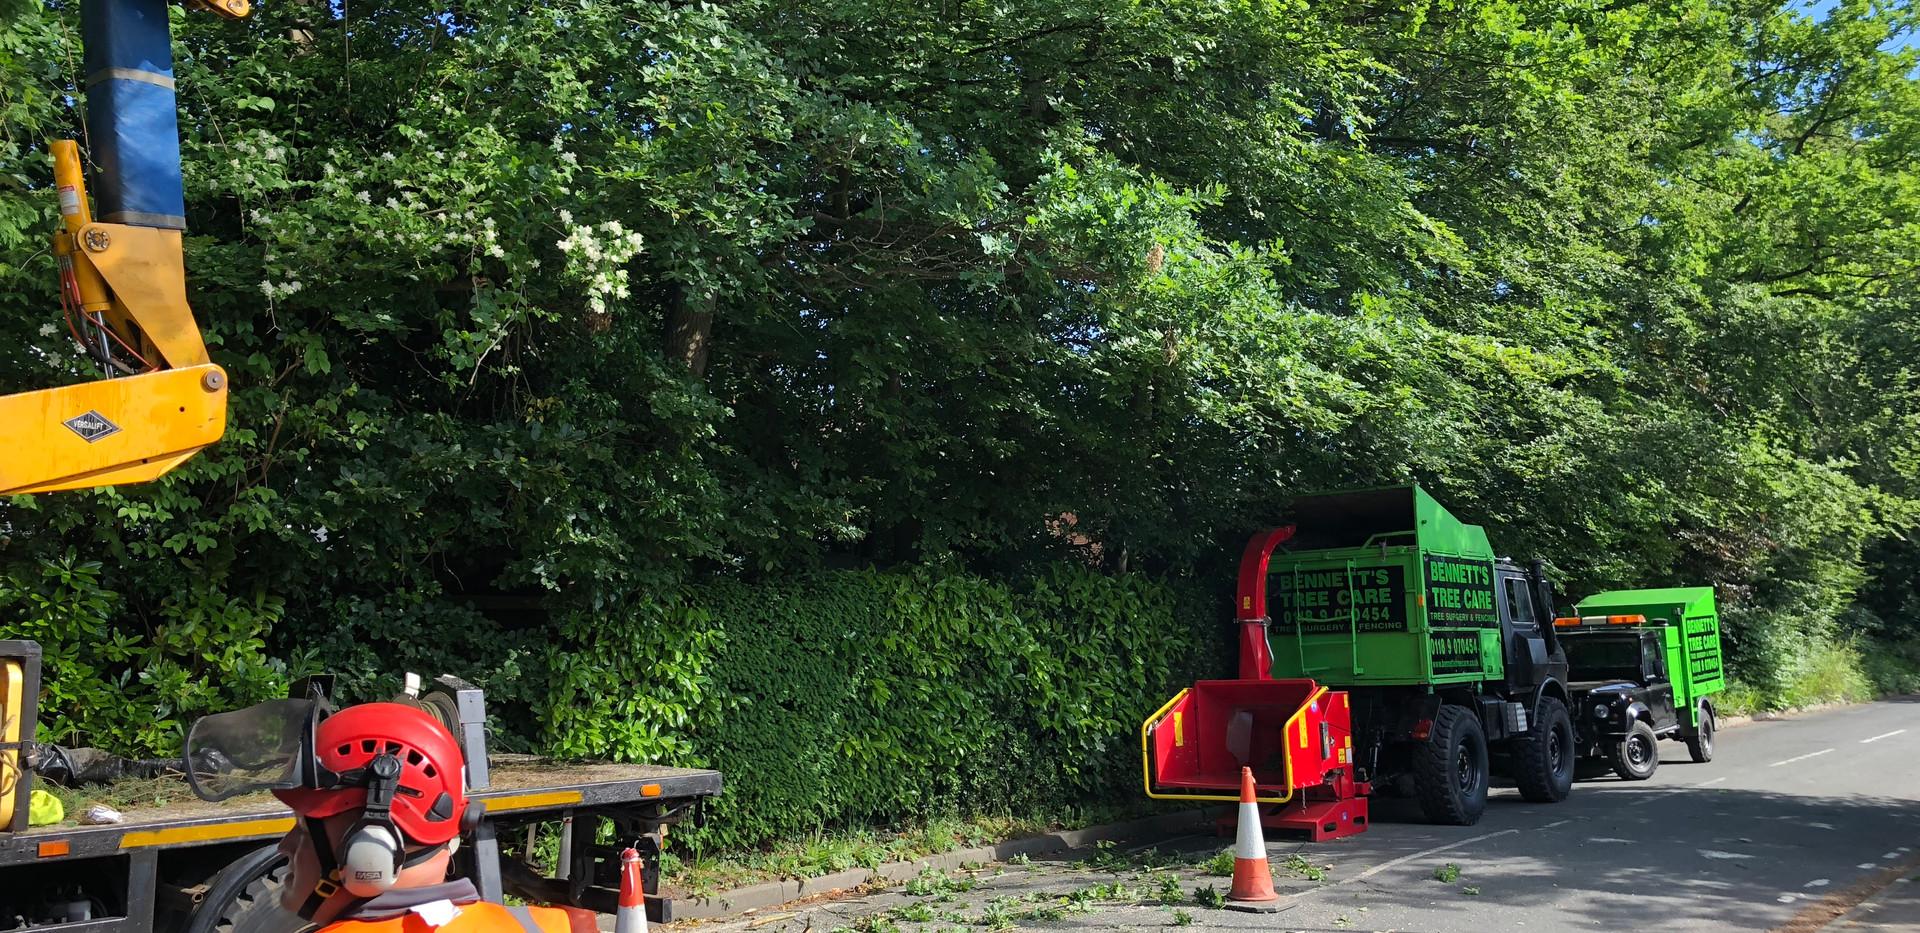 Bennetts Tree Care  road side tree work wokingham beach trebeach reductione reduction